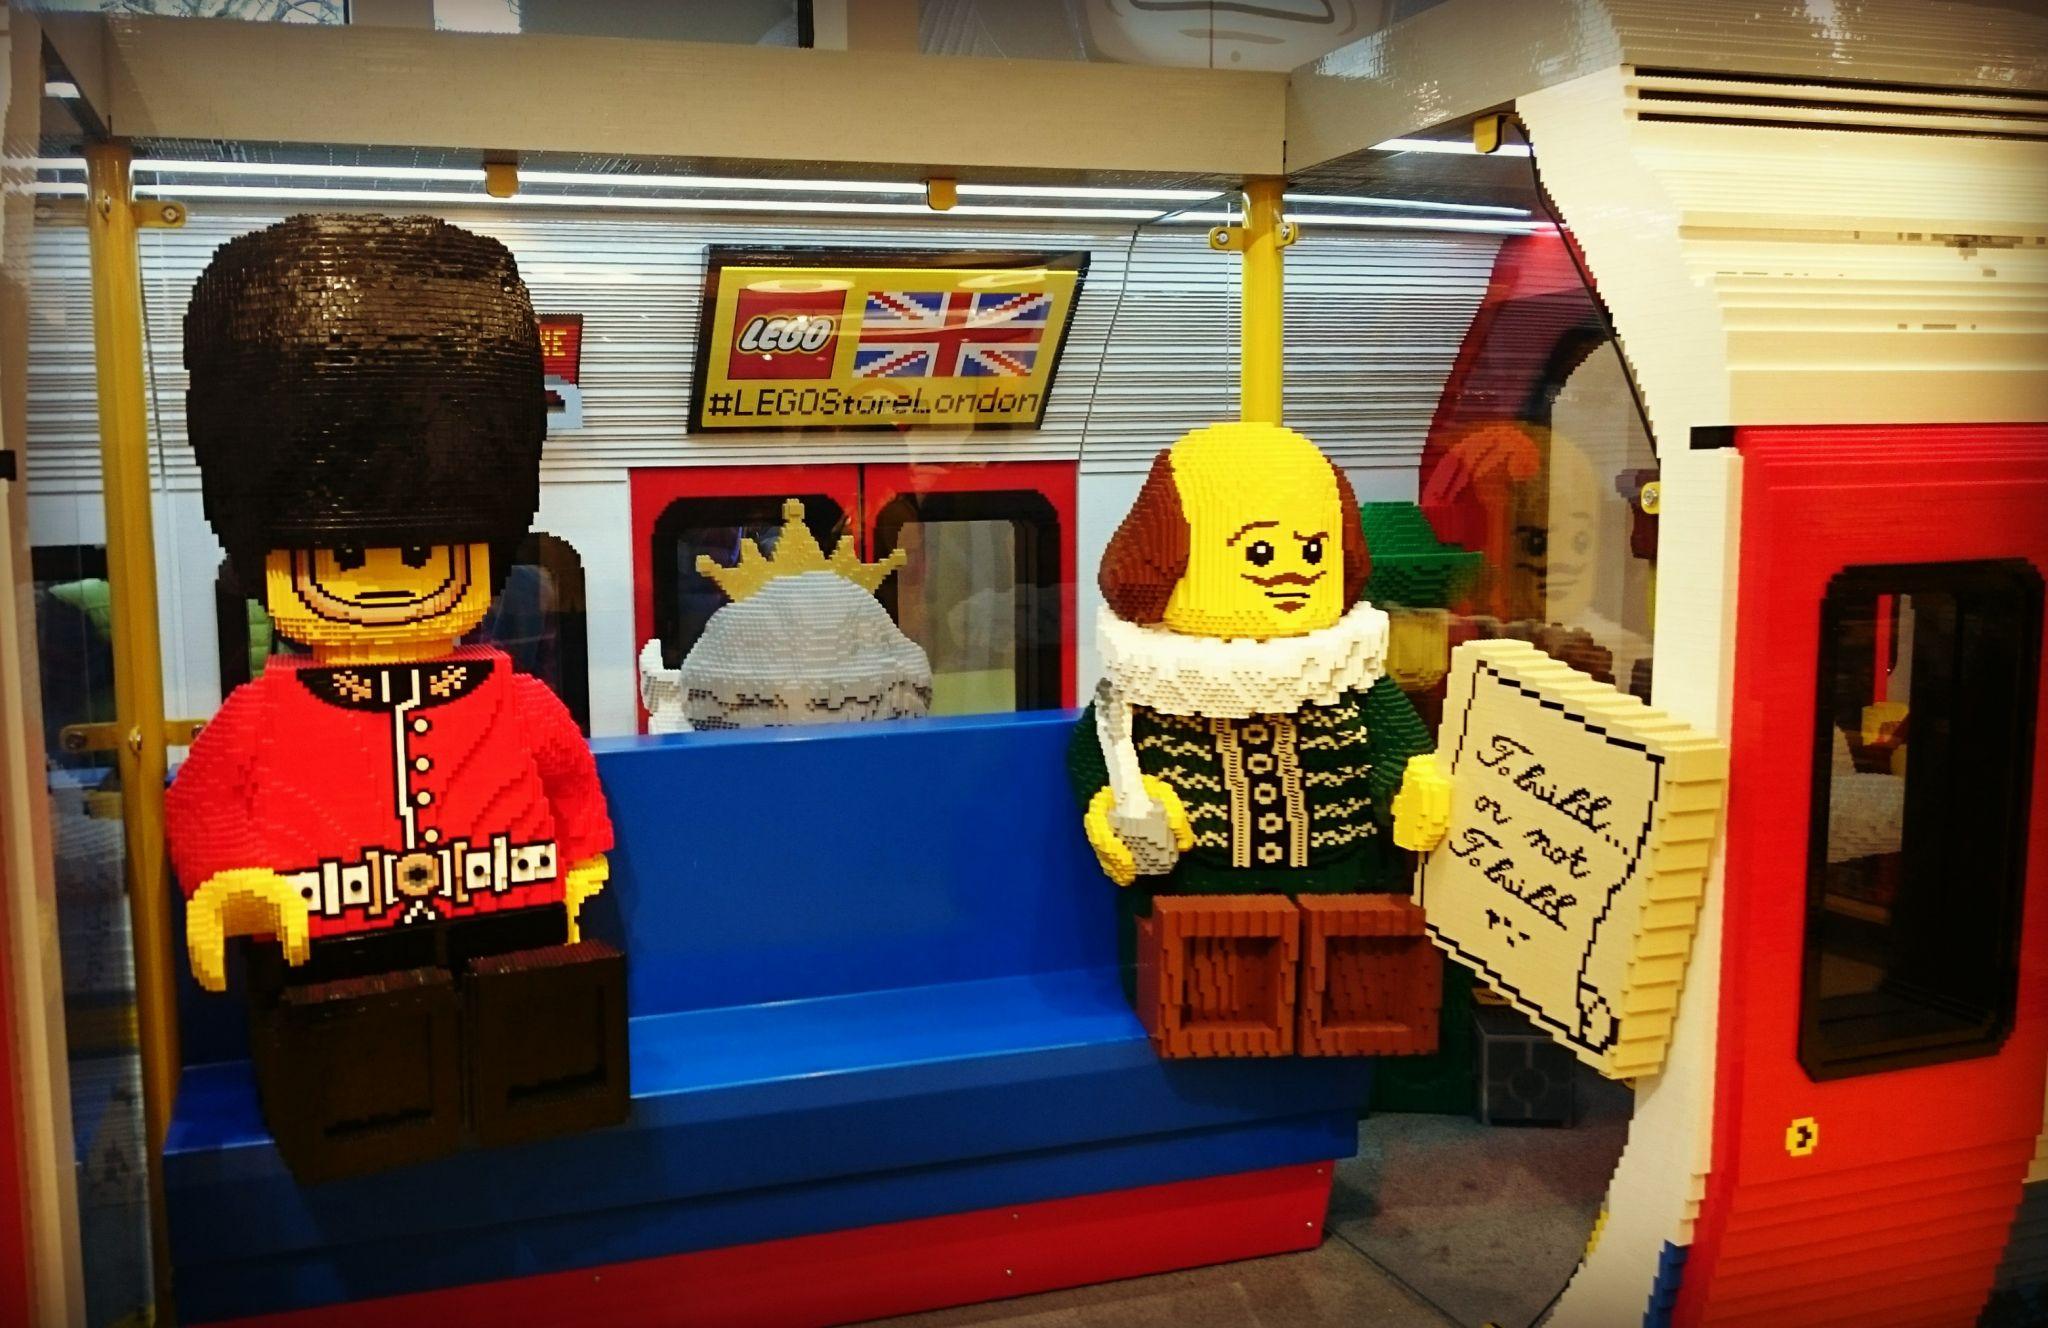 Lego Tube Train, Lego Store, London